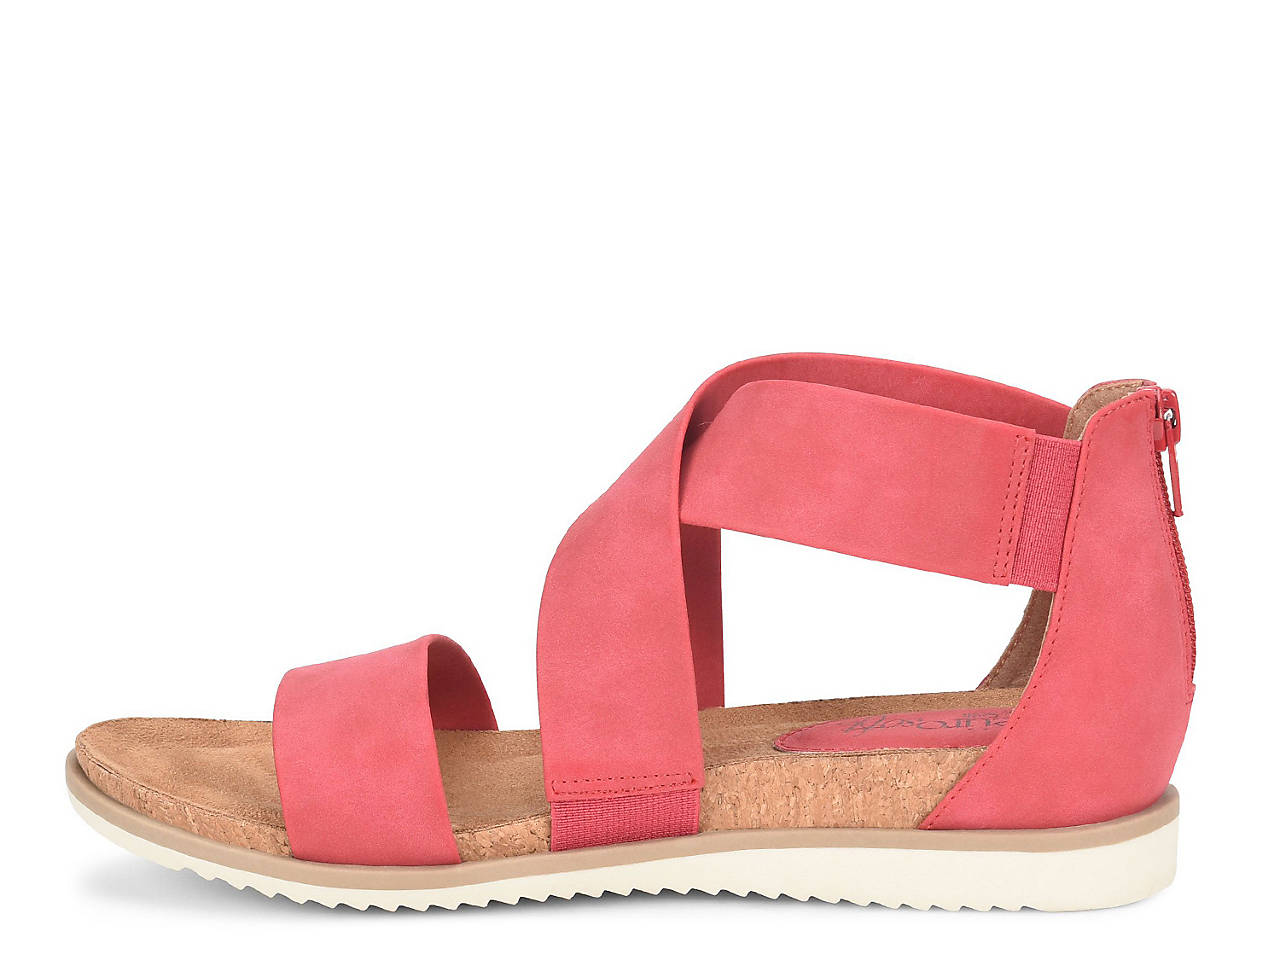 03ae3bb272b Eurosoft Landry II Wedge Sandal Women's Shoes | DSW